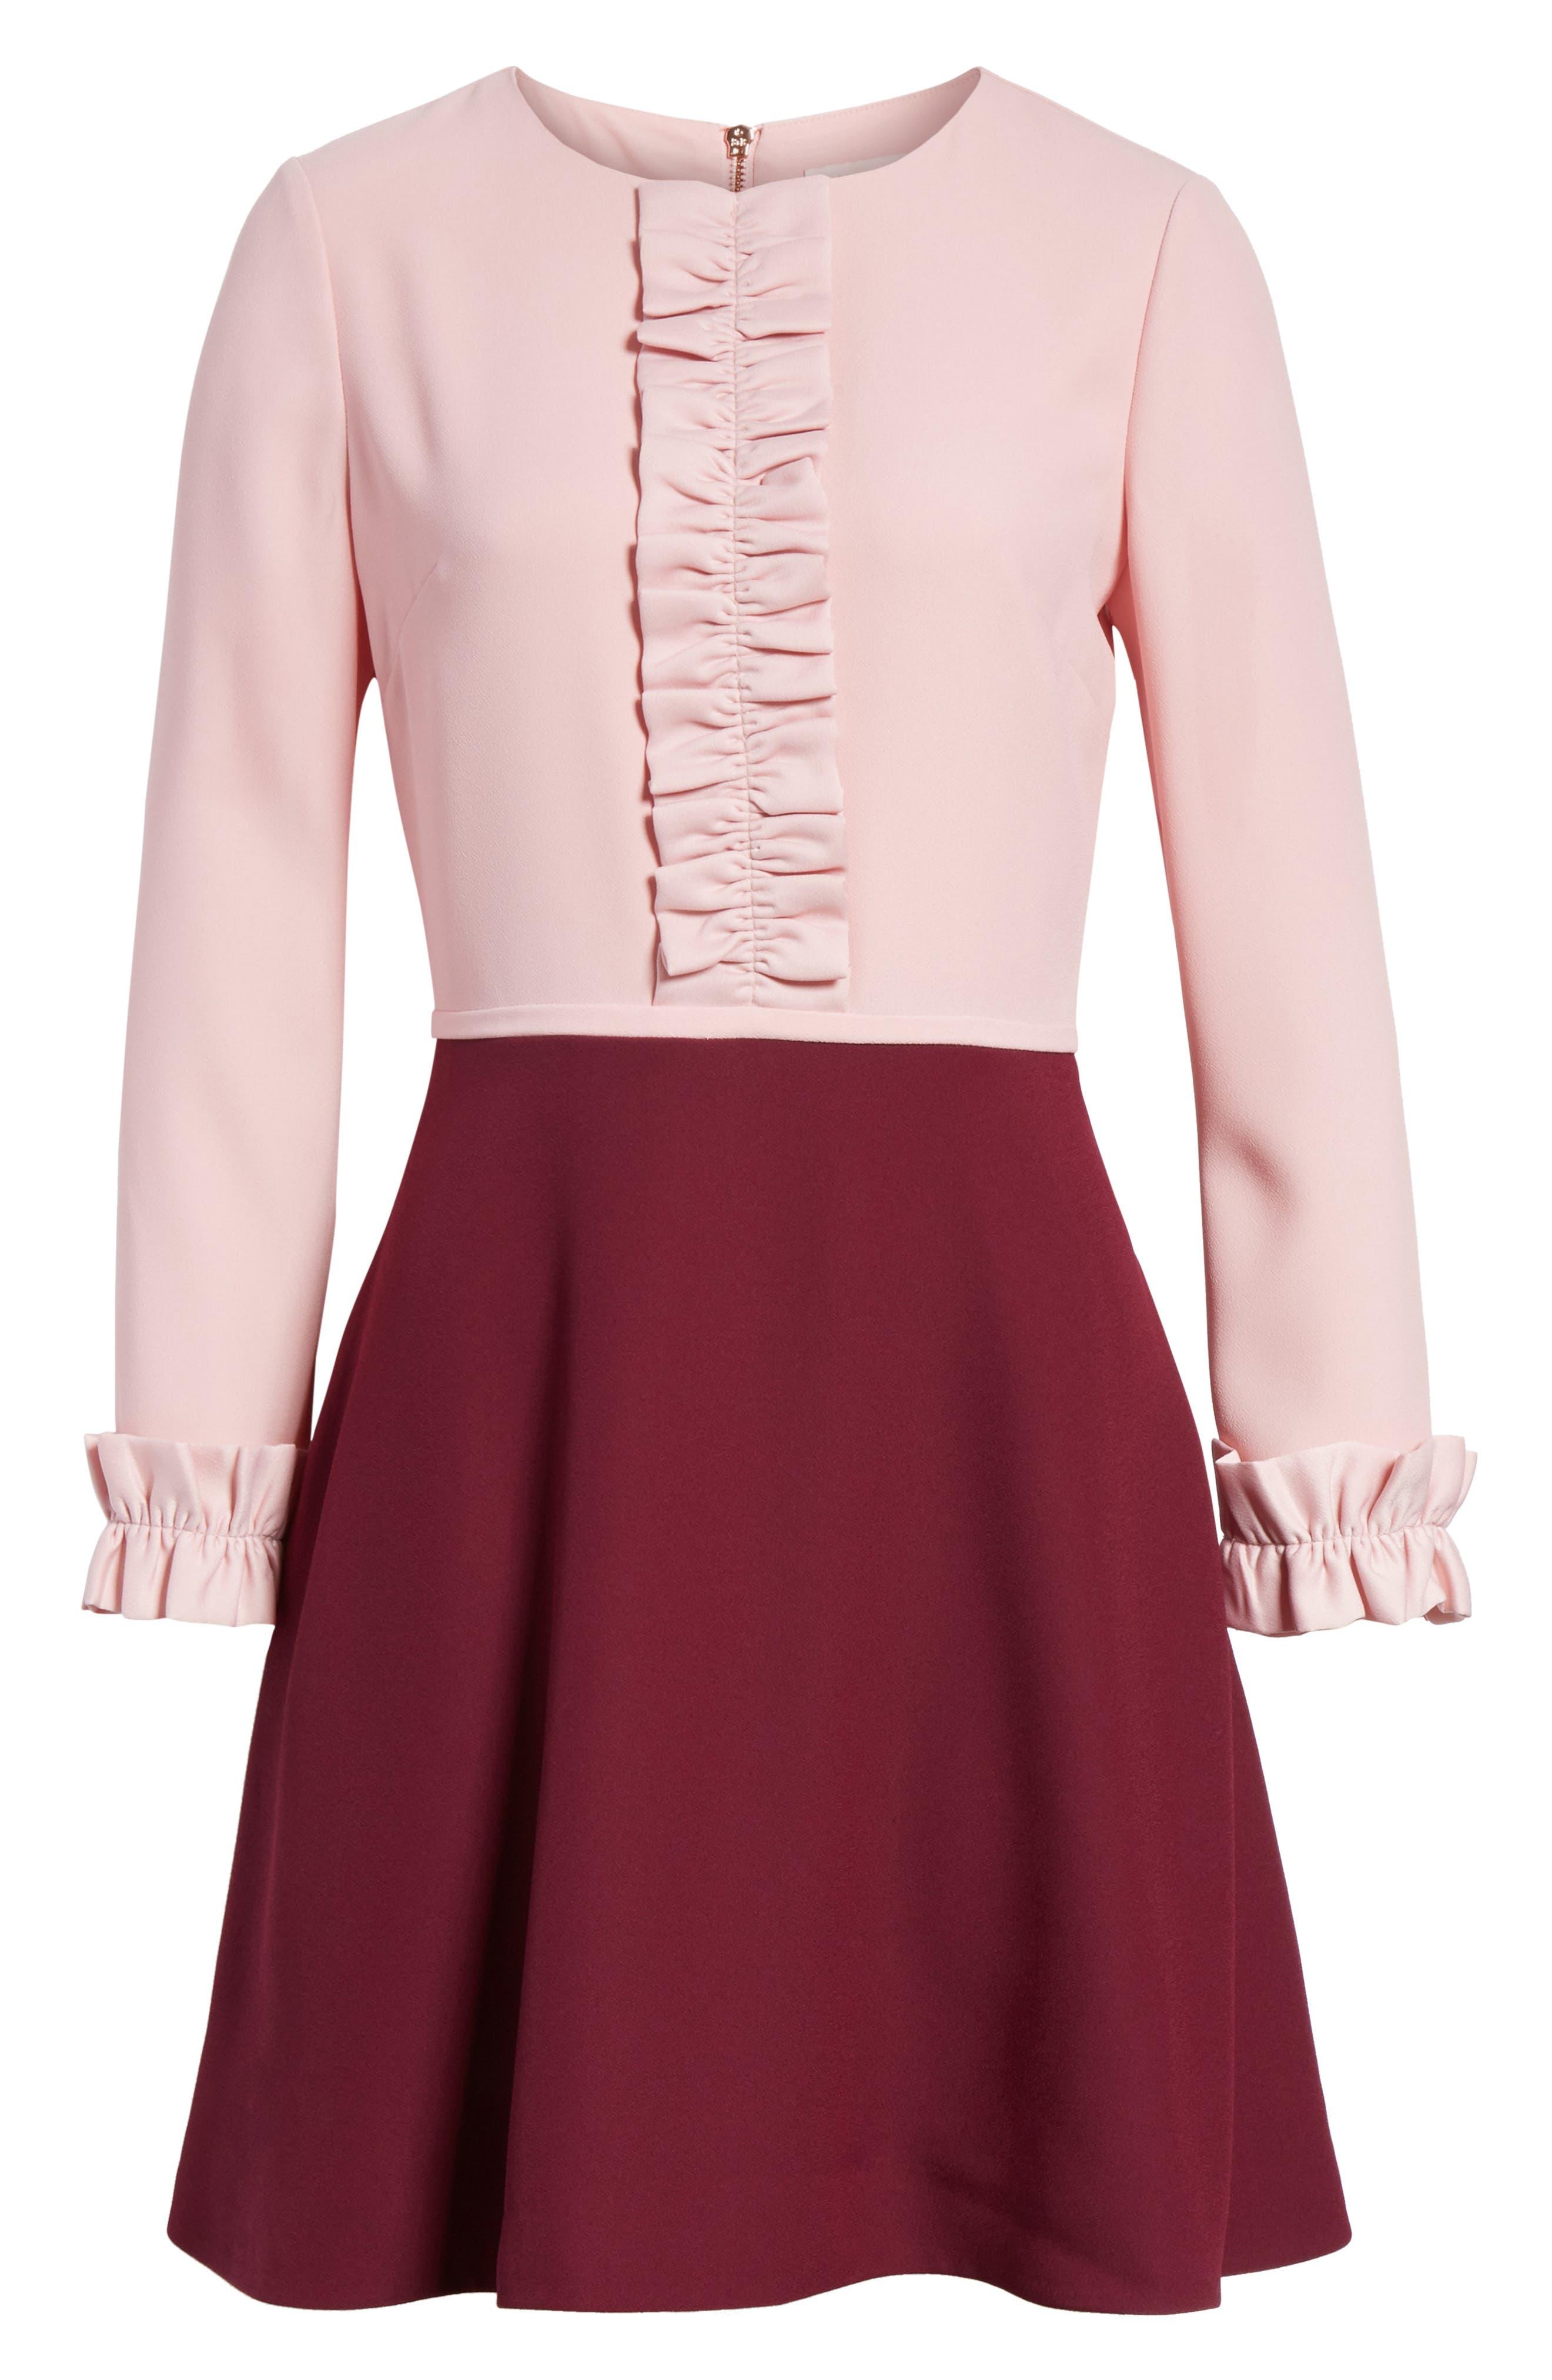 Steyla Ruffle Dress,                             Alternate thumbnail 6, color,                             652